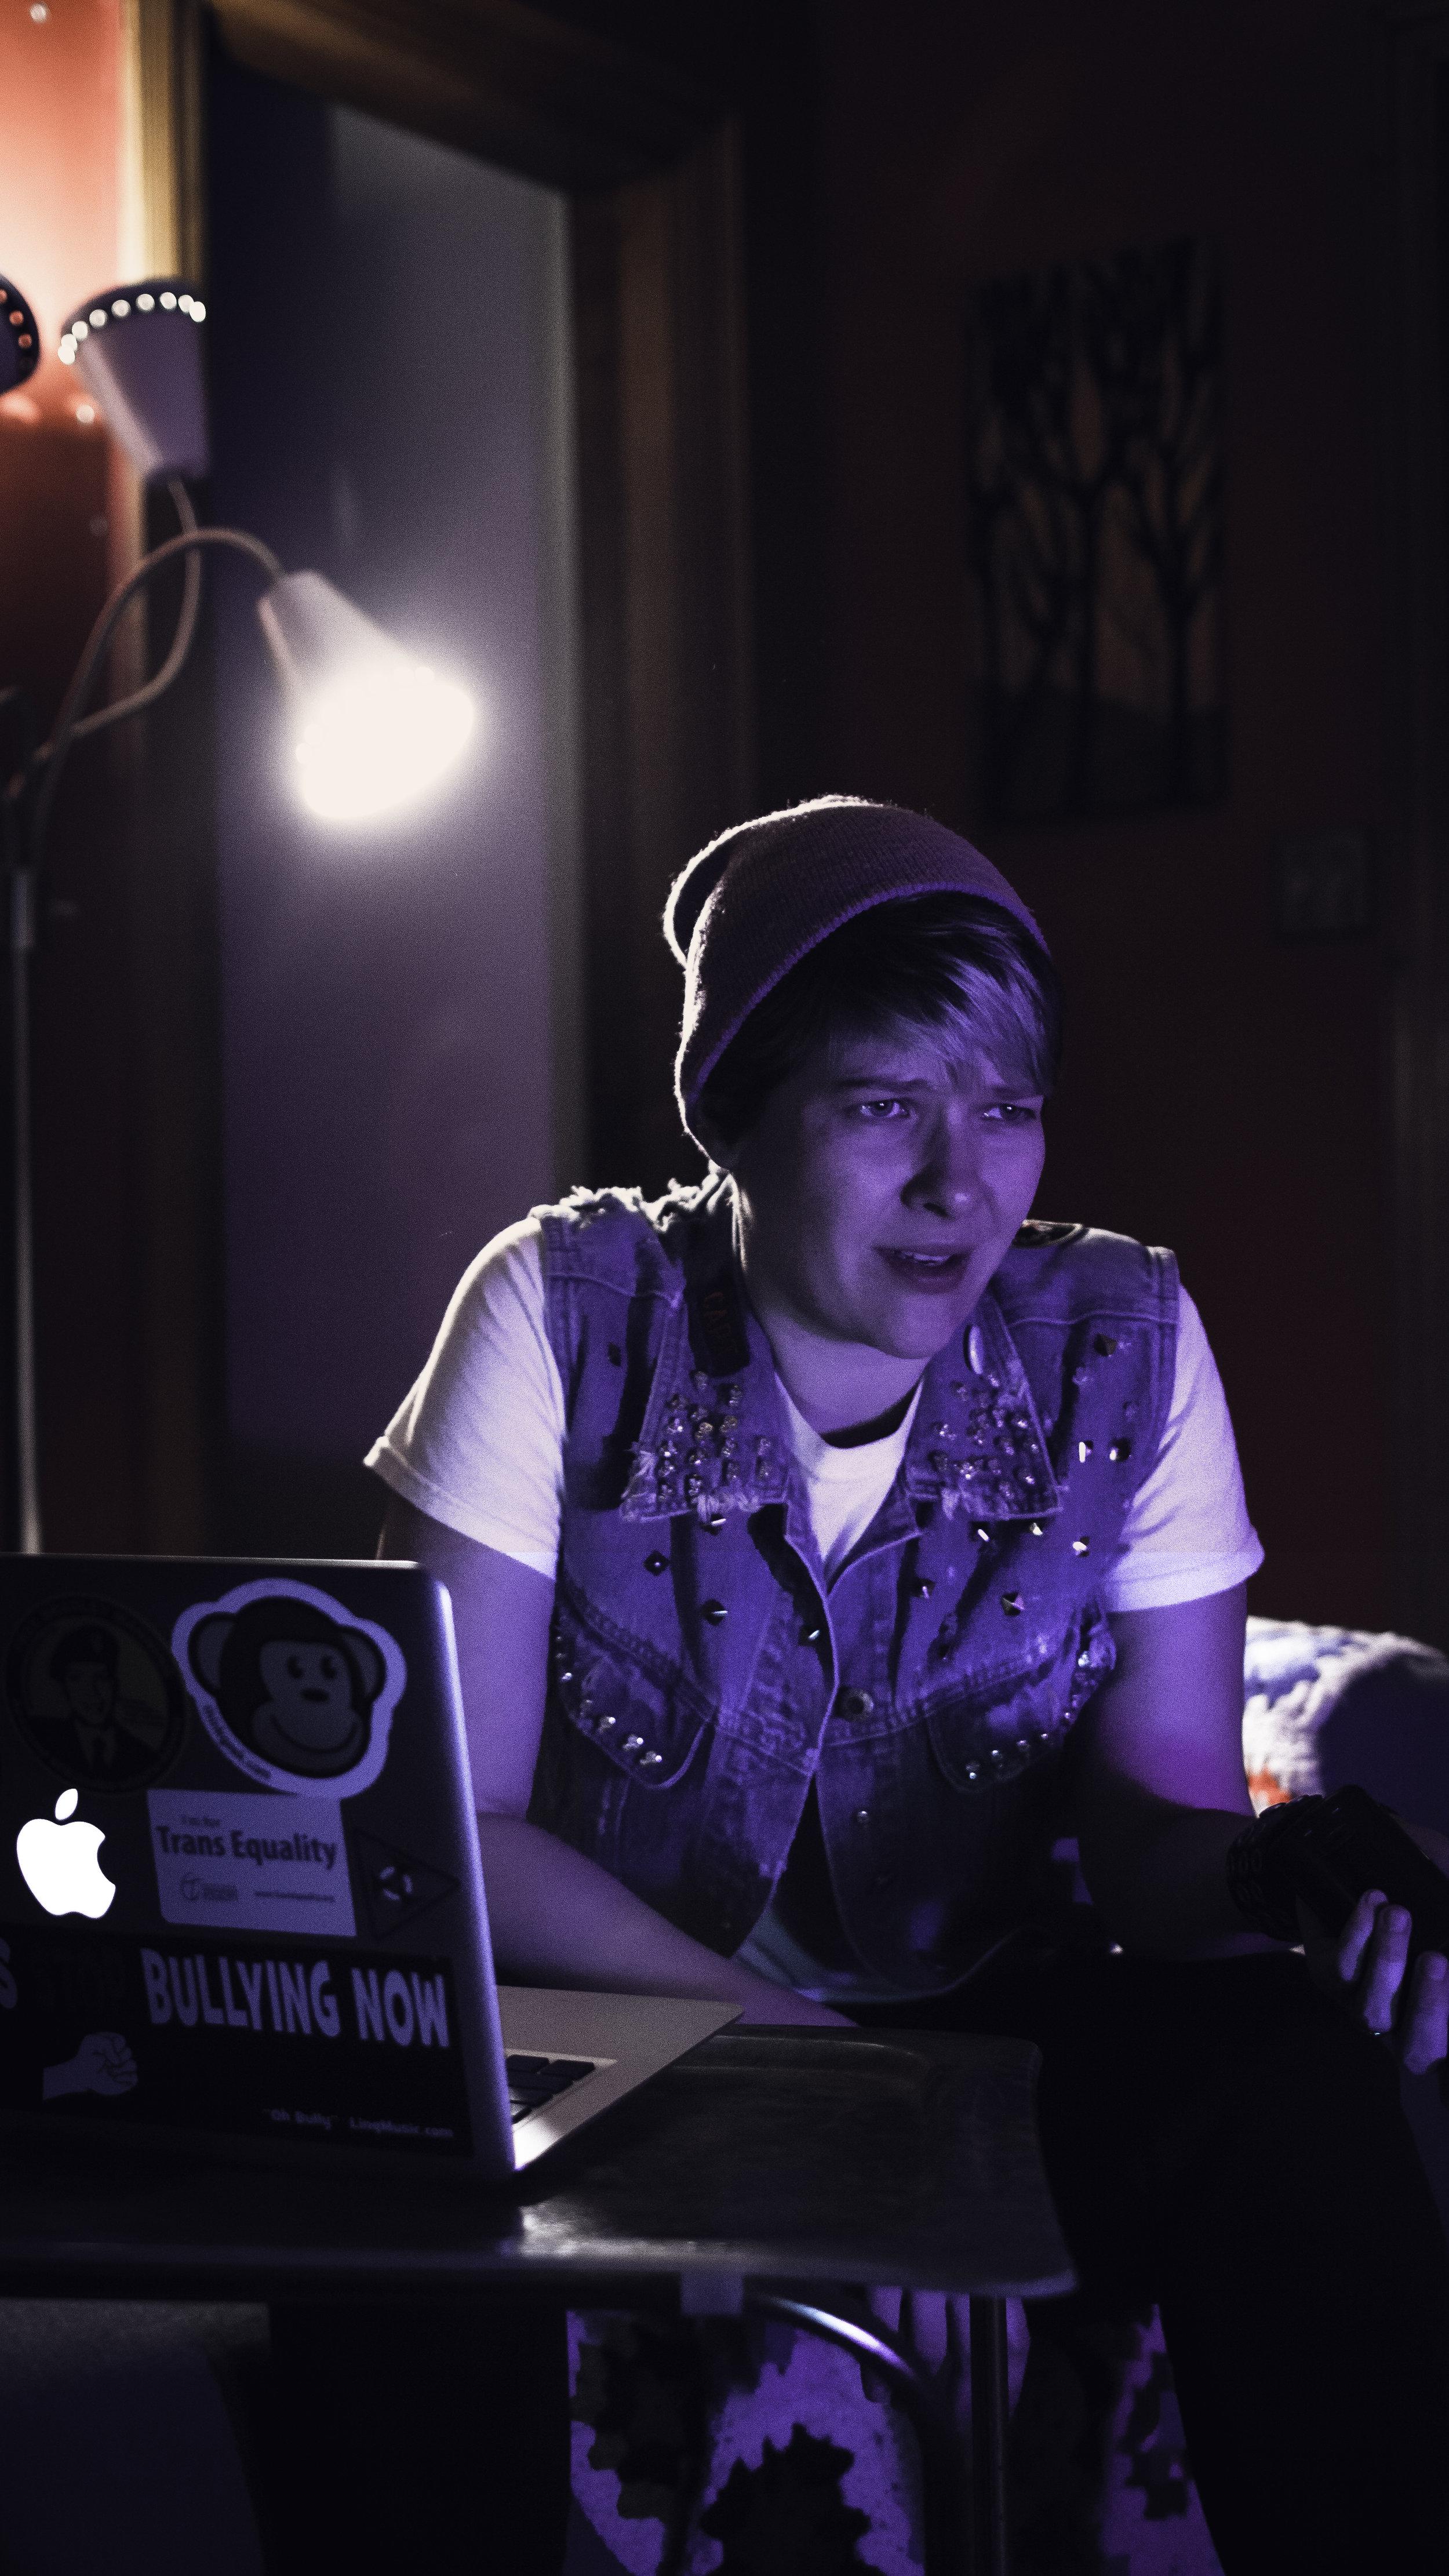 Anna Rose Ii-Epstein as Nate.Photo credit: Christopher Semel